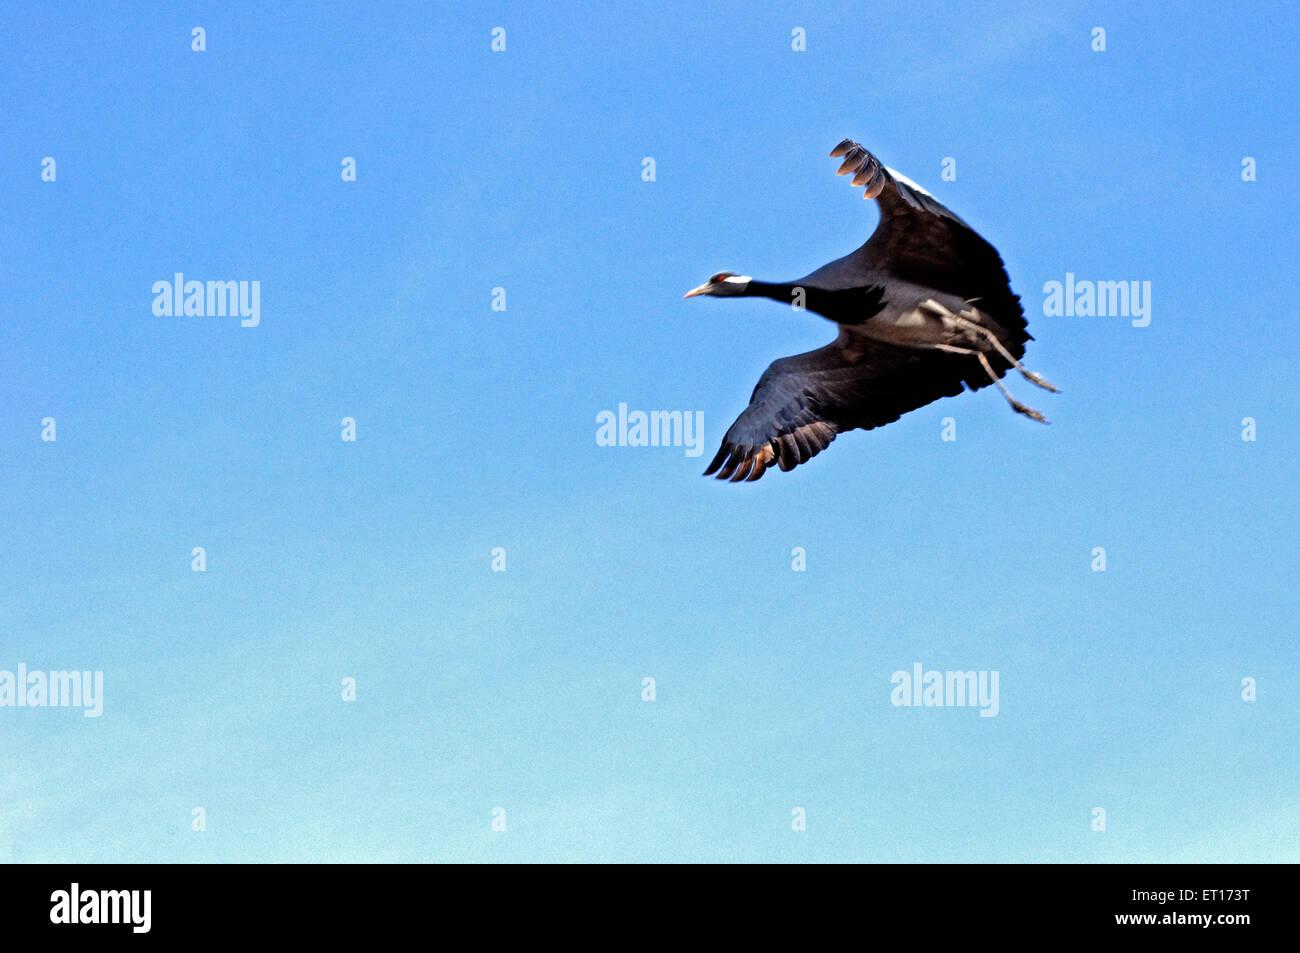 Demoiselle crane flying  ; Kheechan  ; Phalodi  ; Rajasthan  ; India Stock Photo